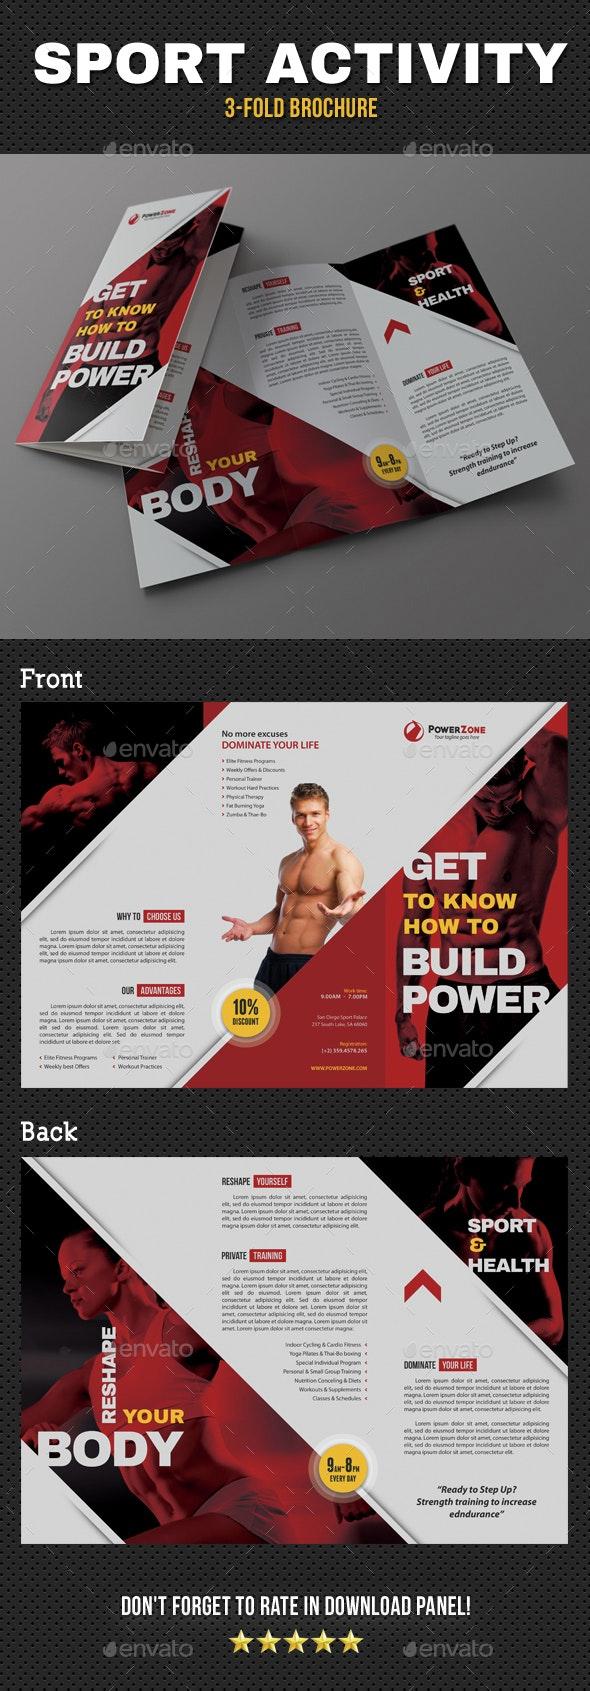 Sport Activity 3-Fold Brochure v03 - Brochures Print Templates